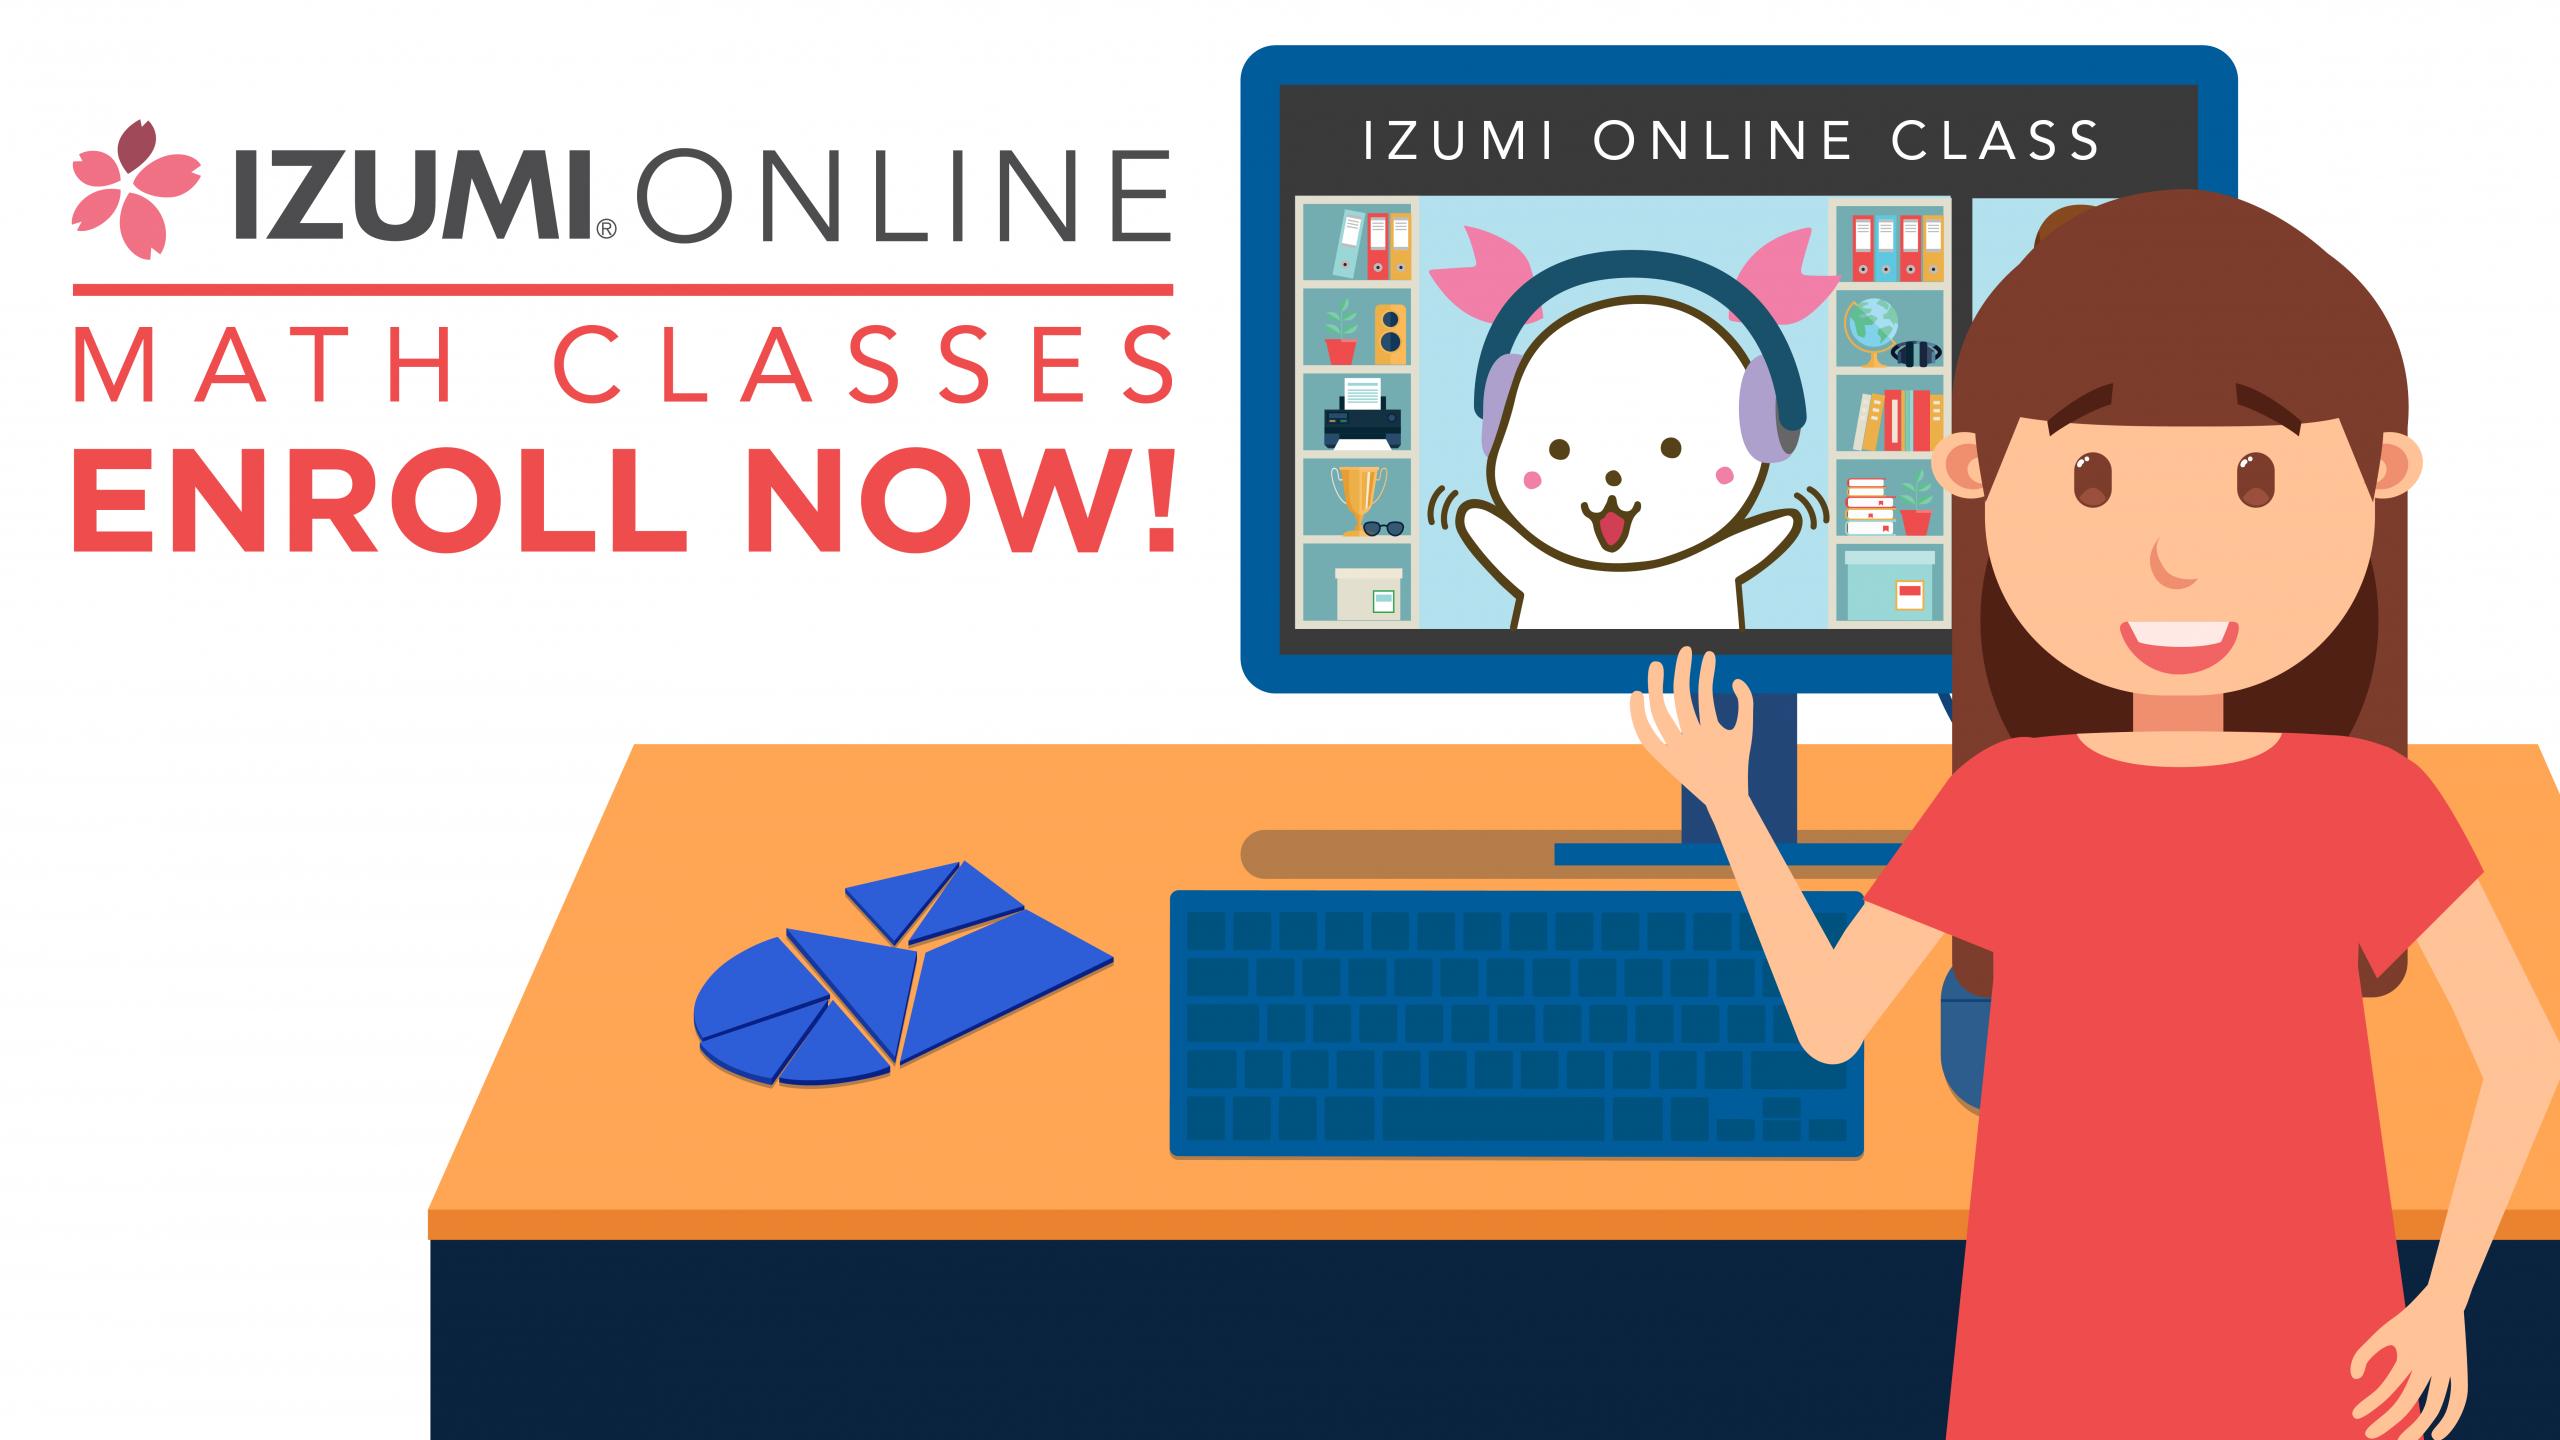 Izumi Online